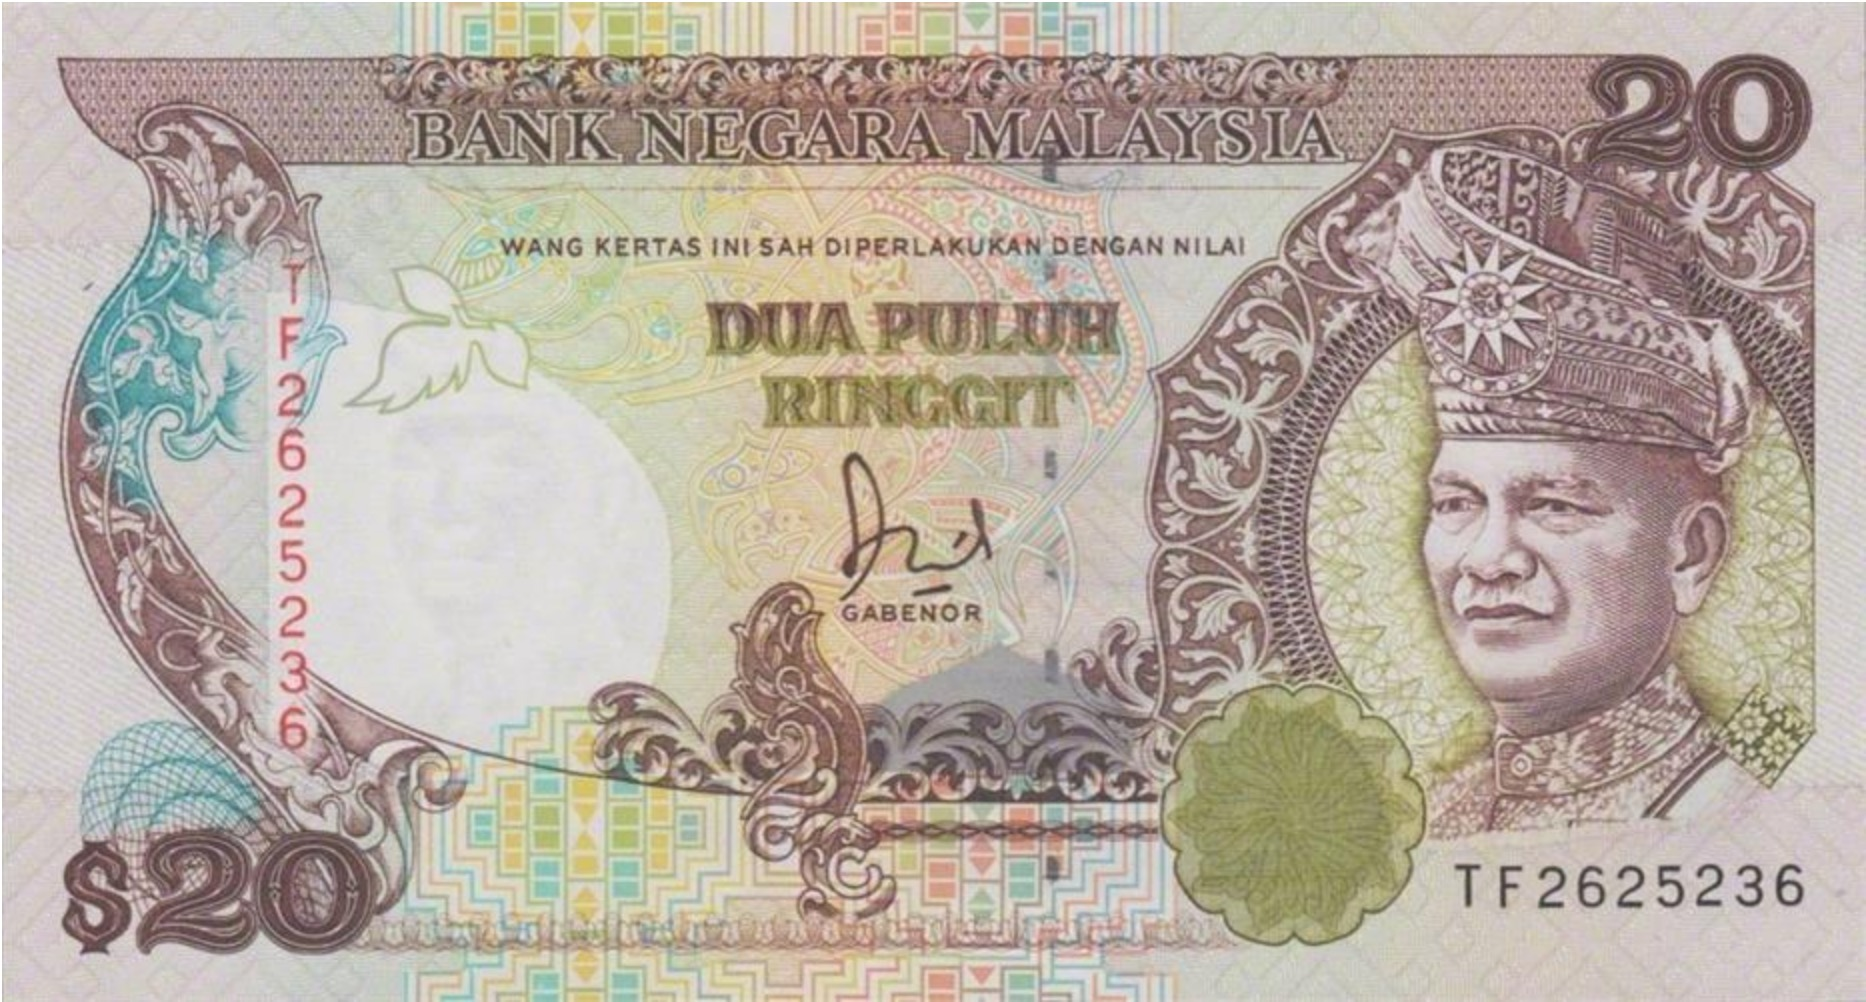 20 Malaysian Ringgit 2nd series 1989